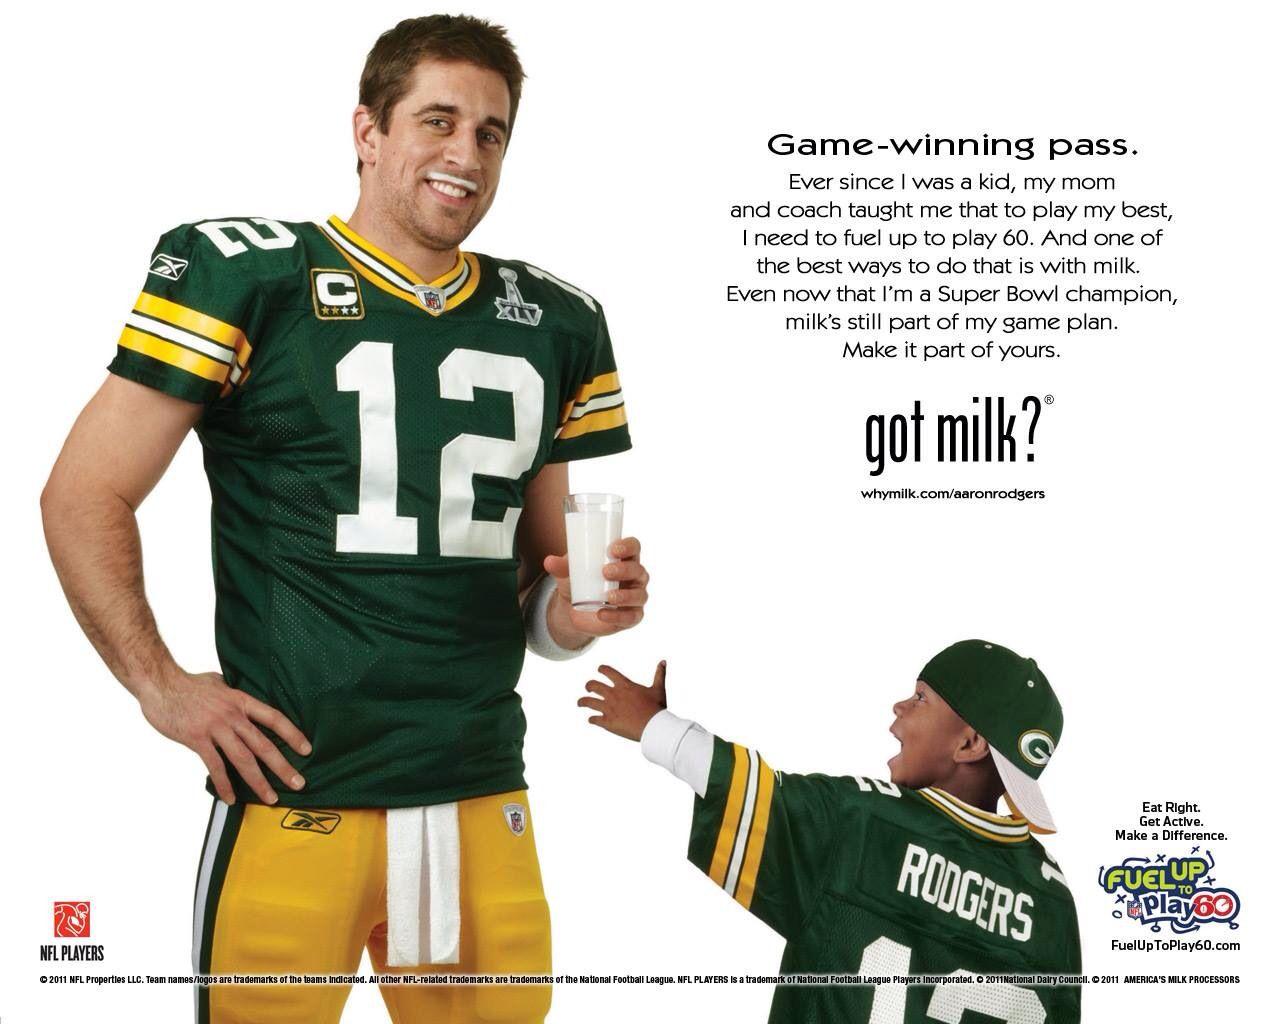 Got Milk Greenbay Aaronrodgers Green Bay Packers Team Rodgers Green Bay Green Bay Packers